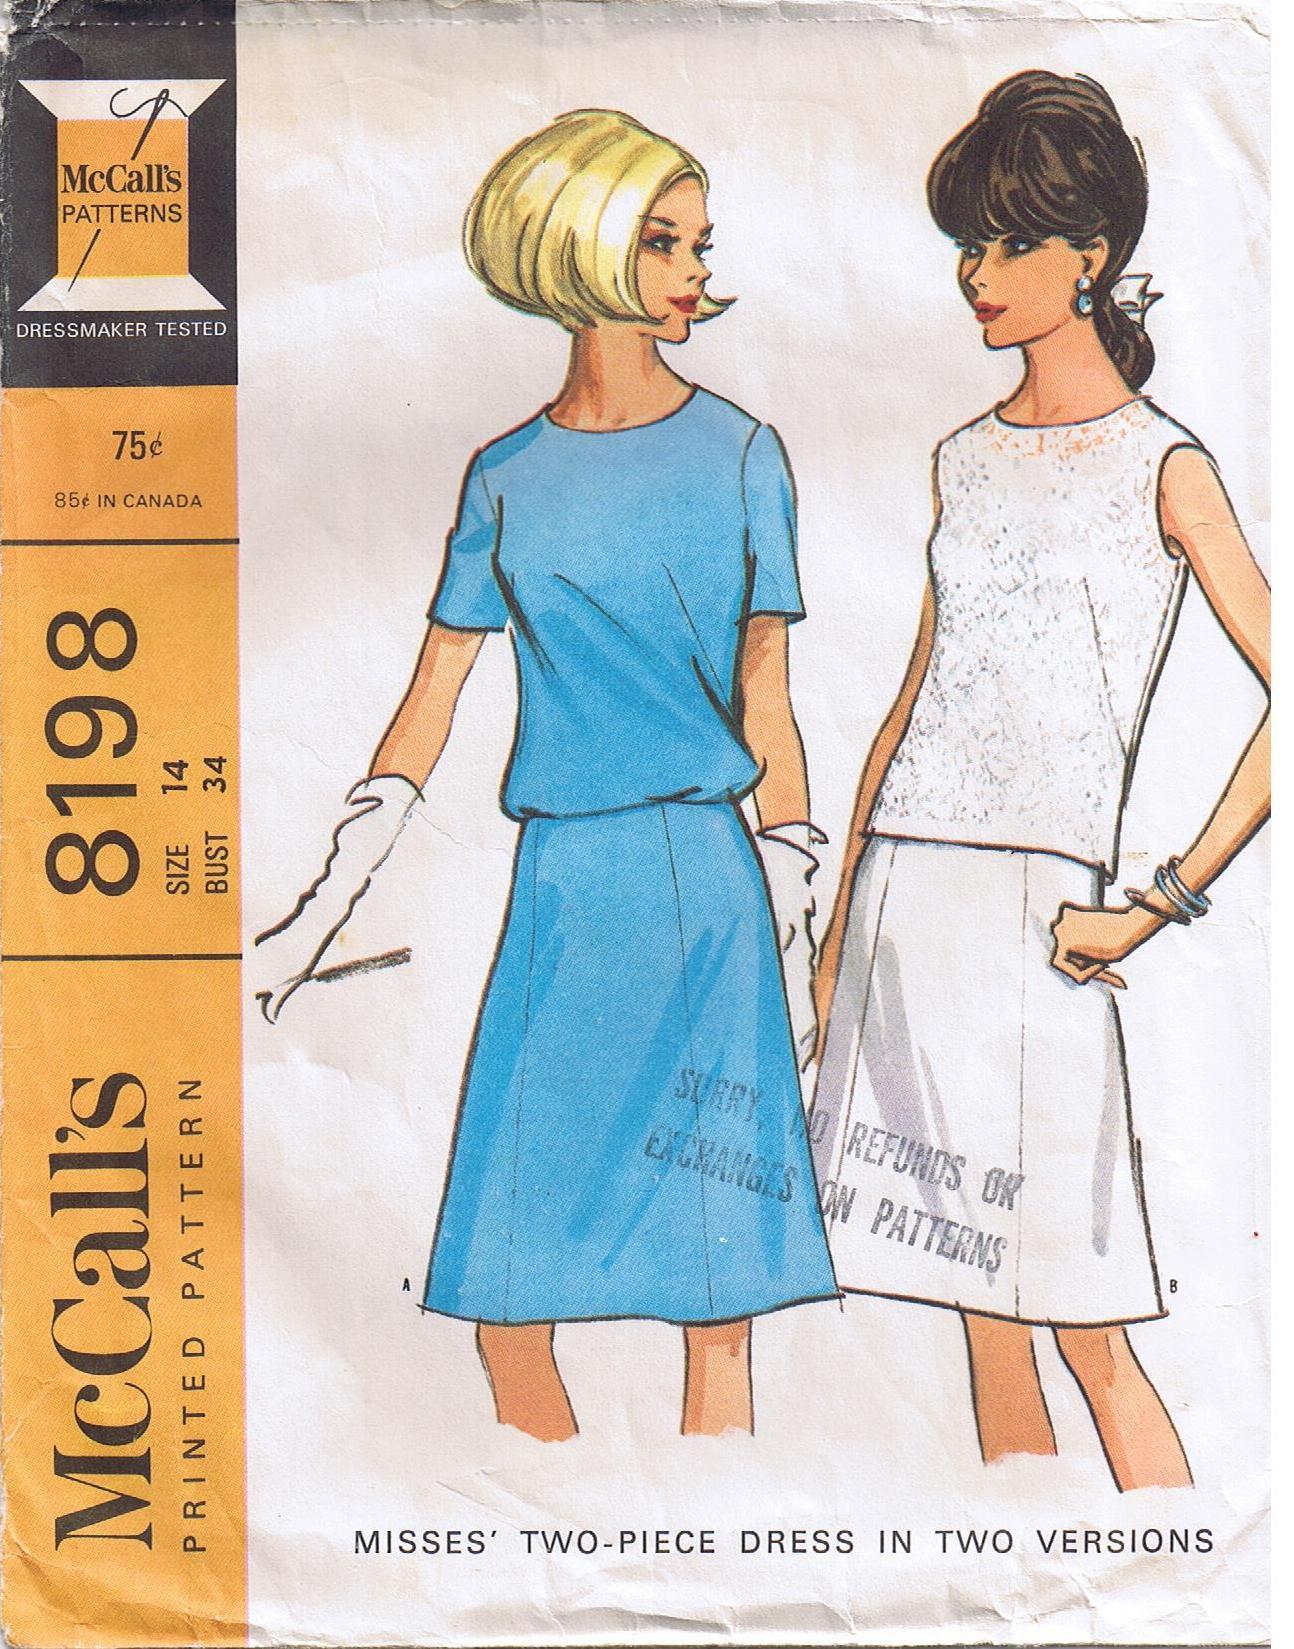 McCall's 8198 A